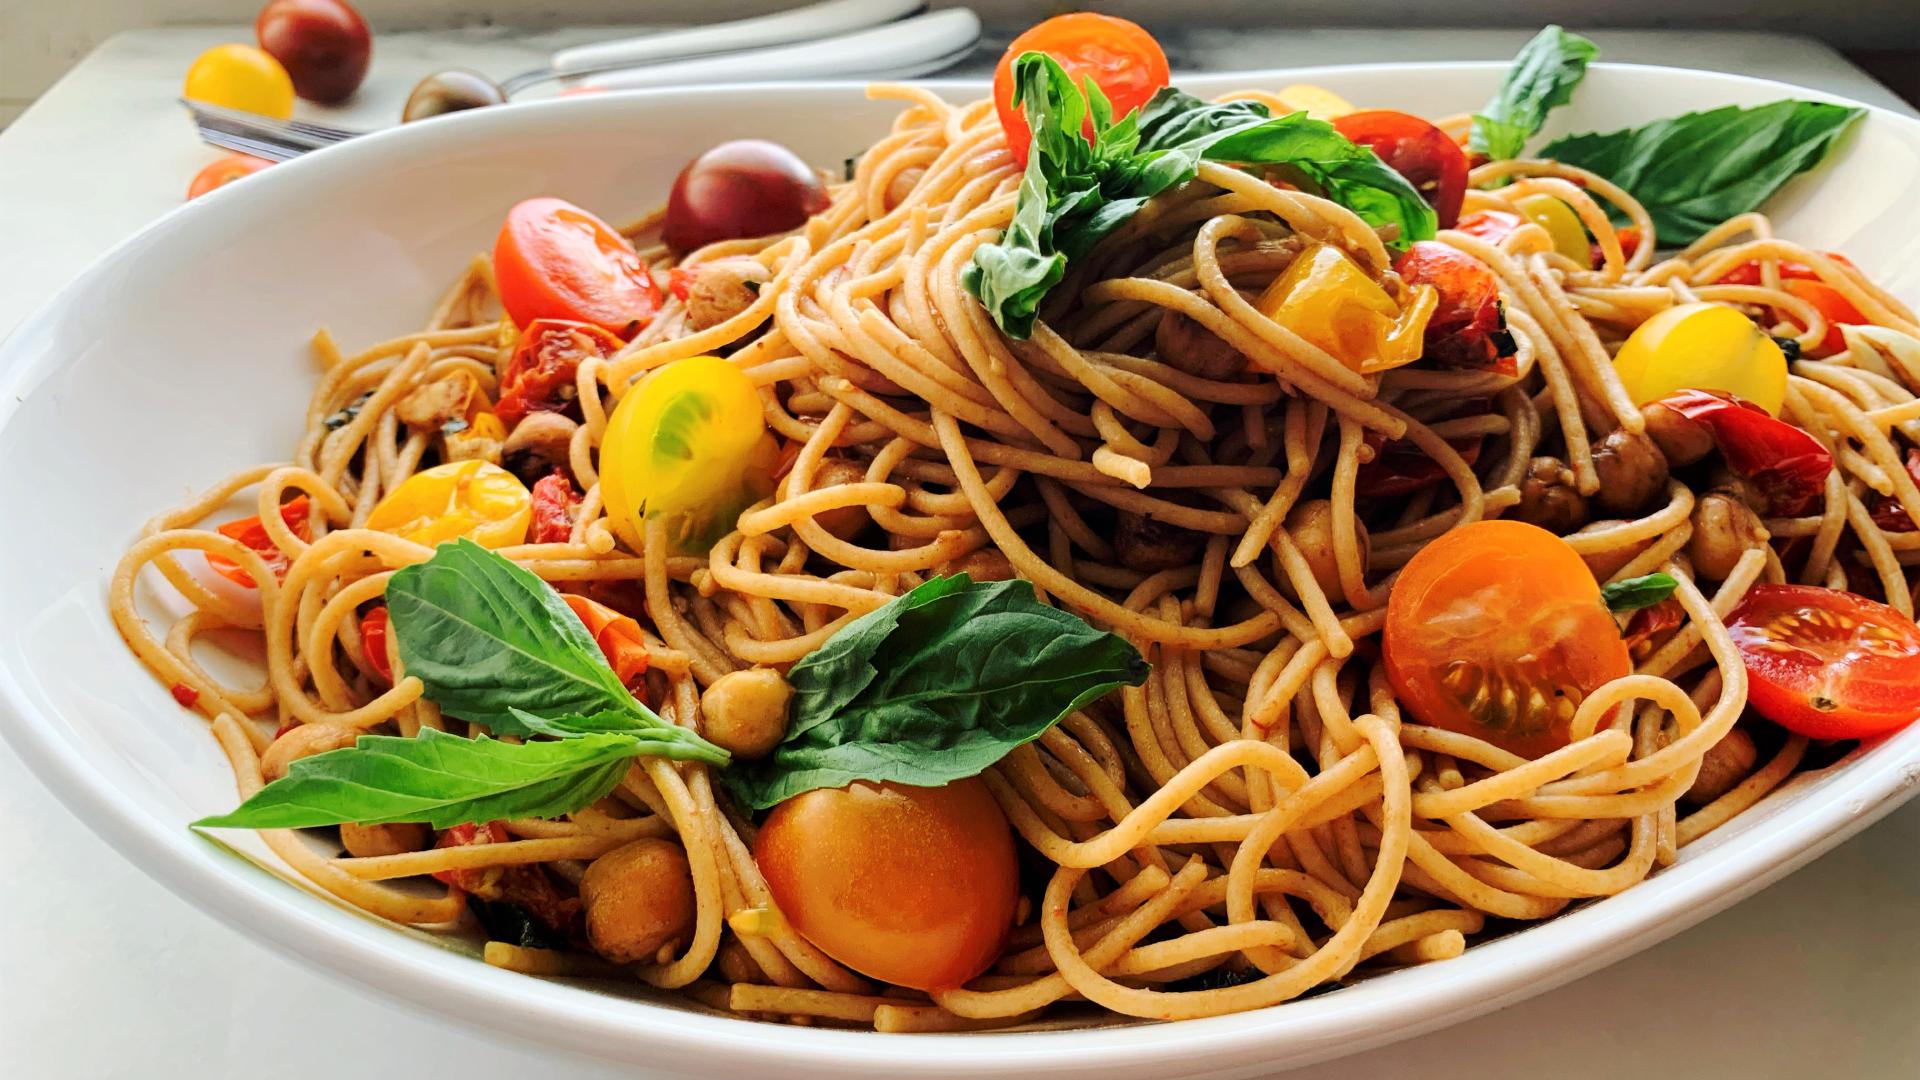 Spaghetti avec tomates dans un plat blanc